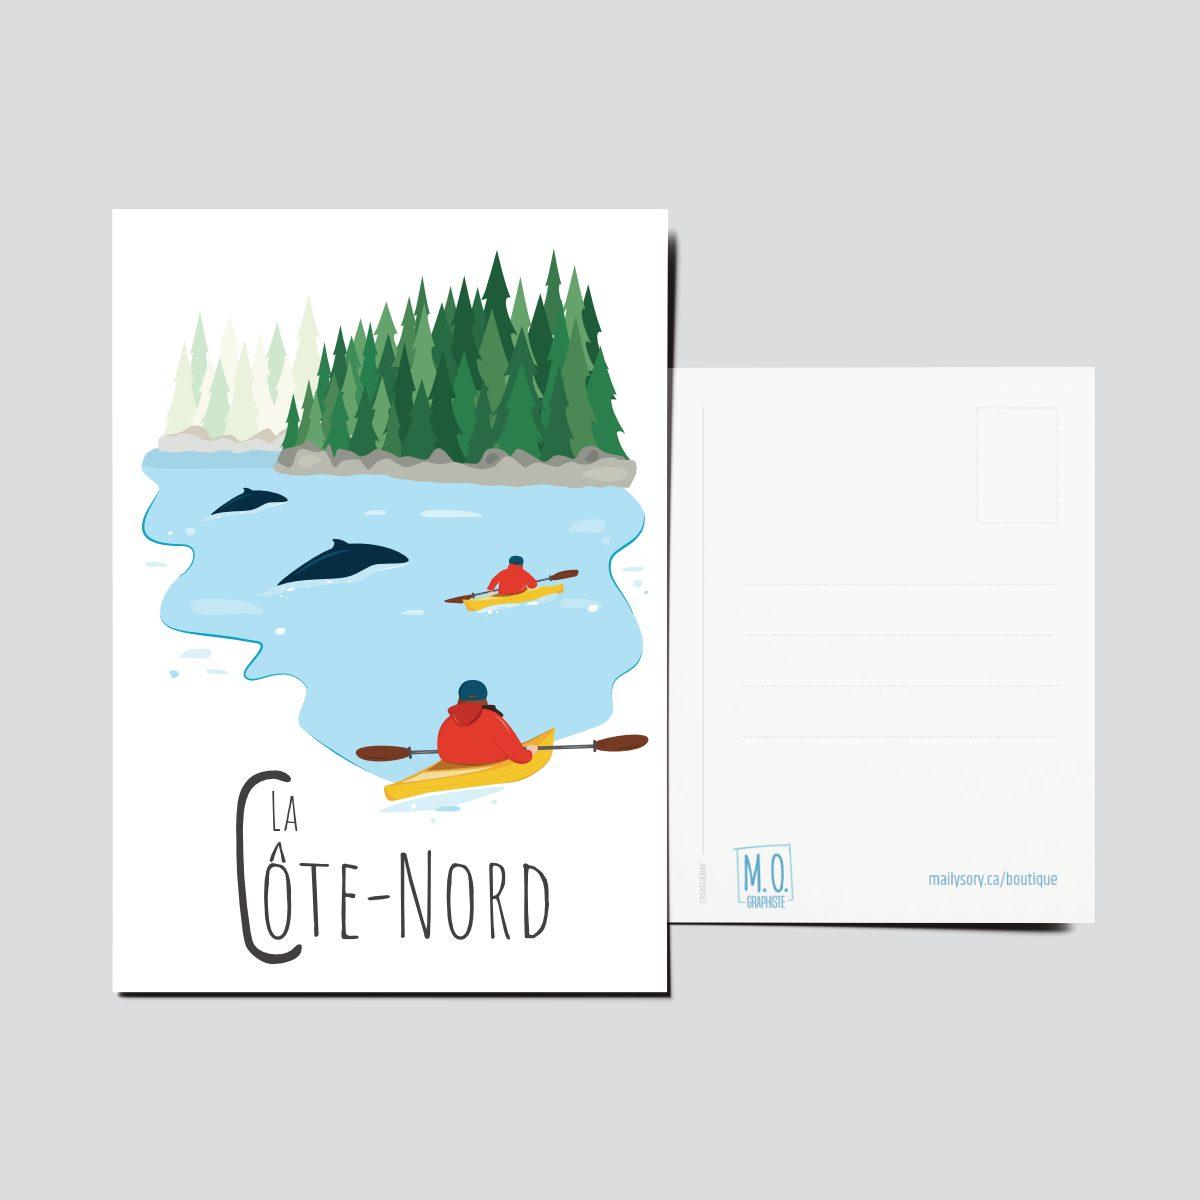 Mailys ORY - Graphiste   Illustration - Carte postale - La Côte-Nord